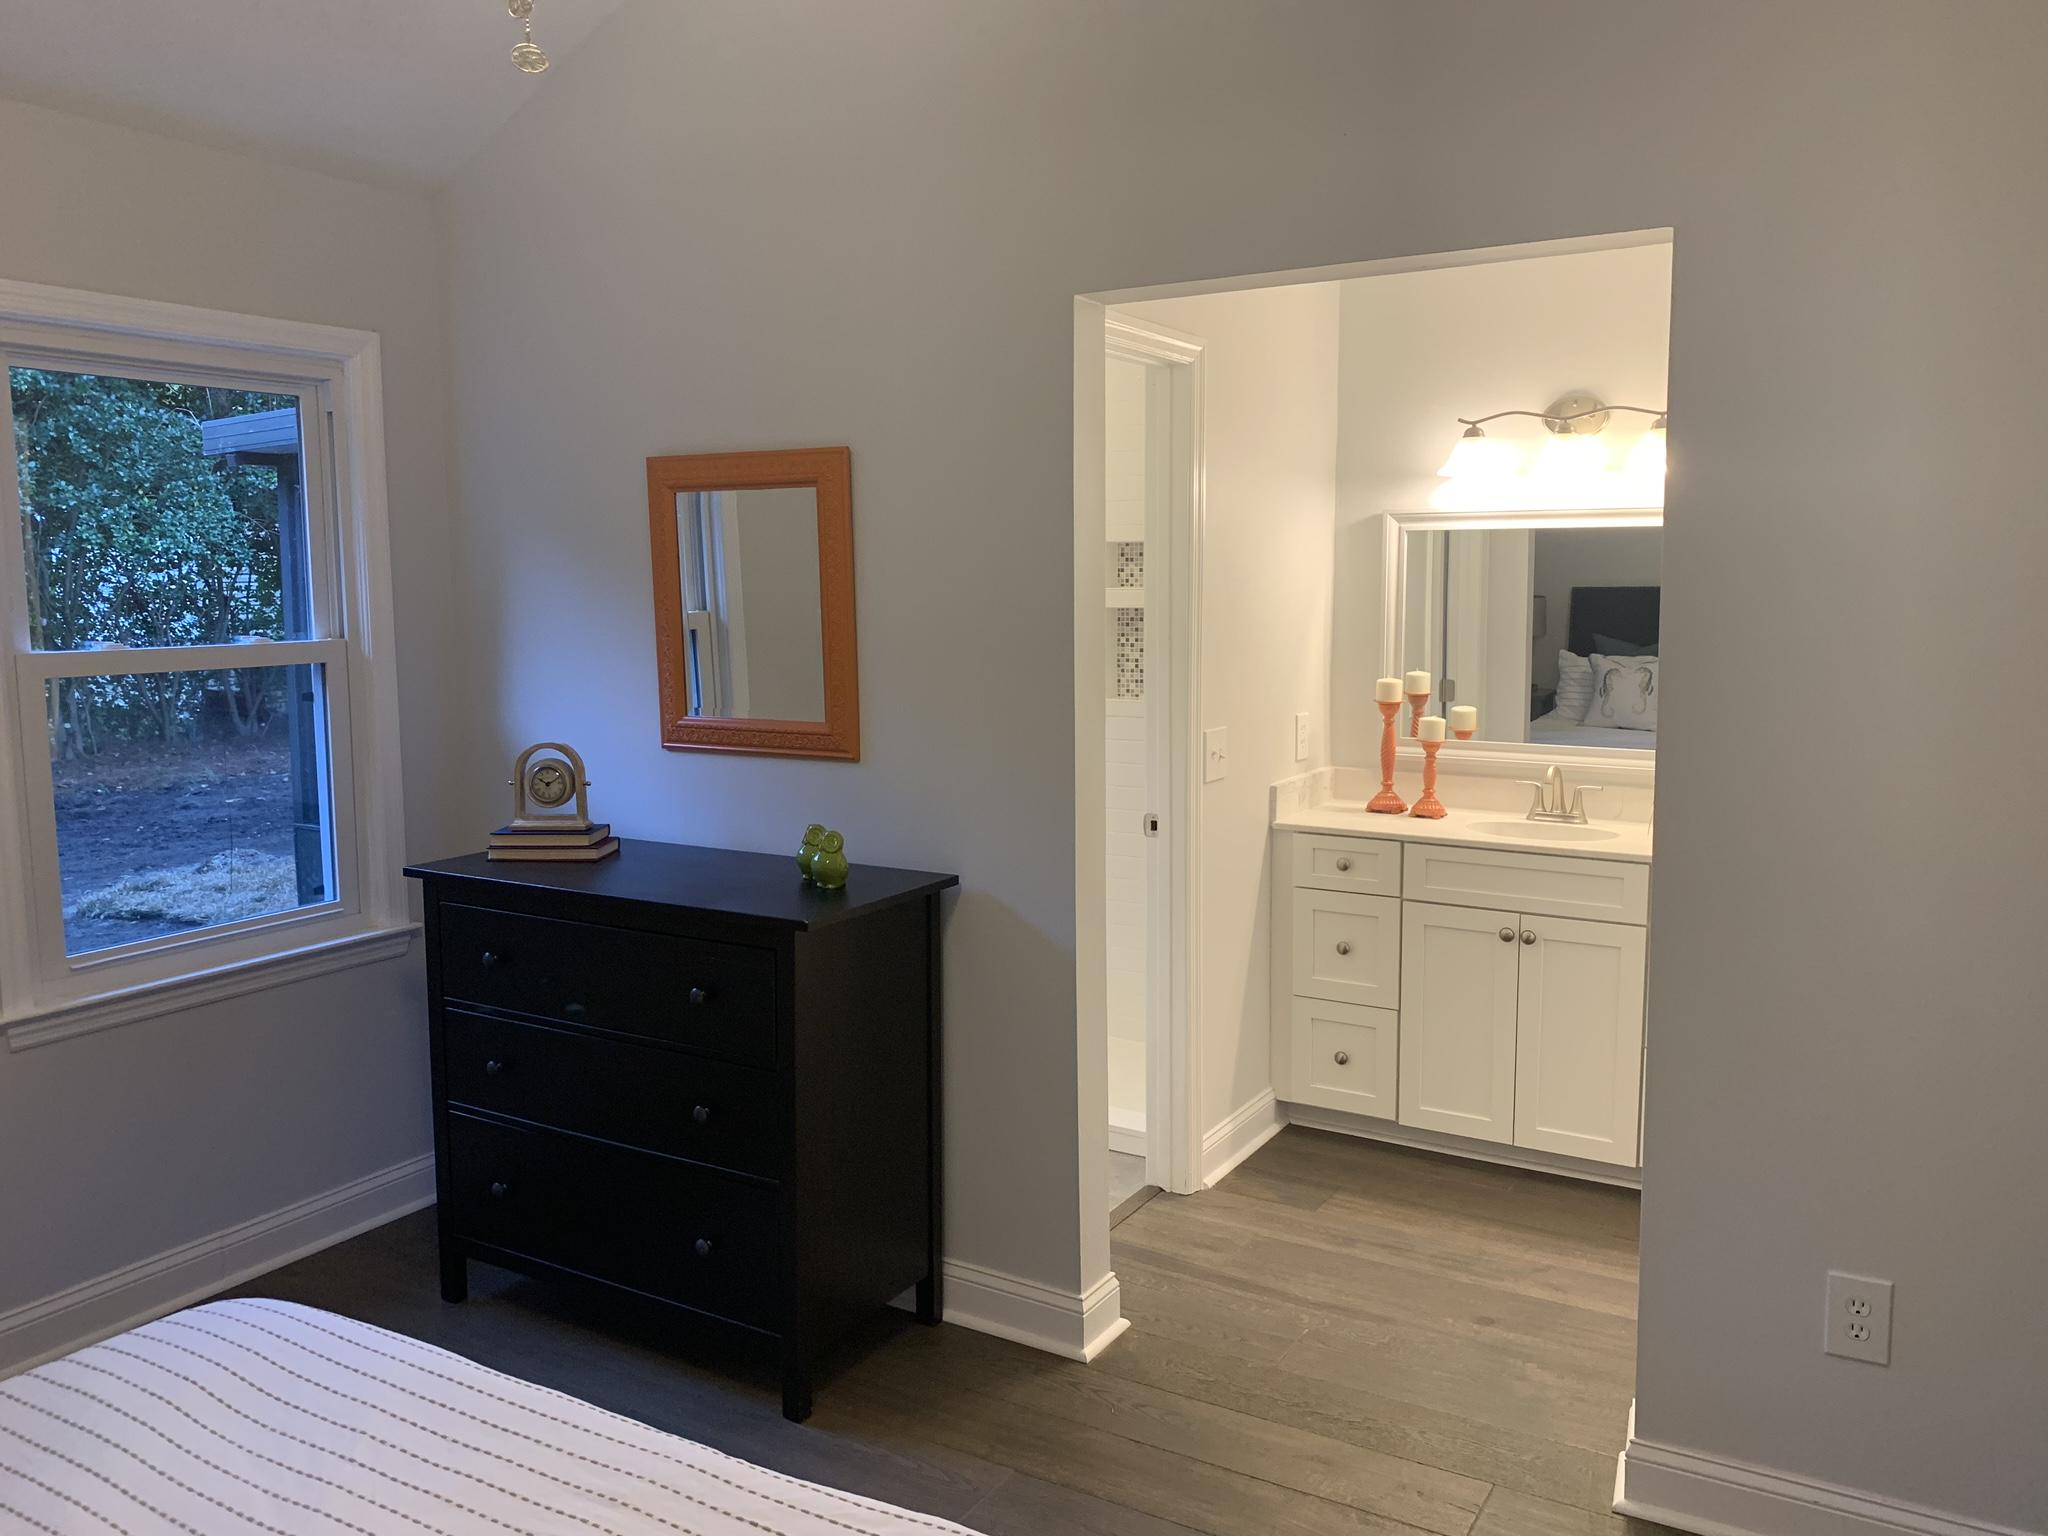 Heathwood Ext Homes For Sale - 2 Blaine, Charleston, SC - 11